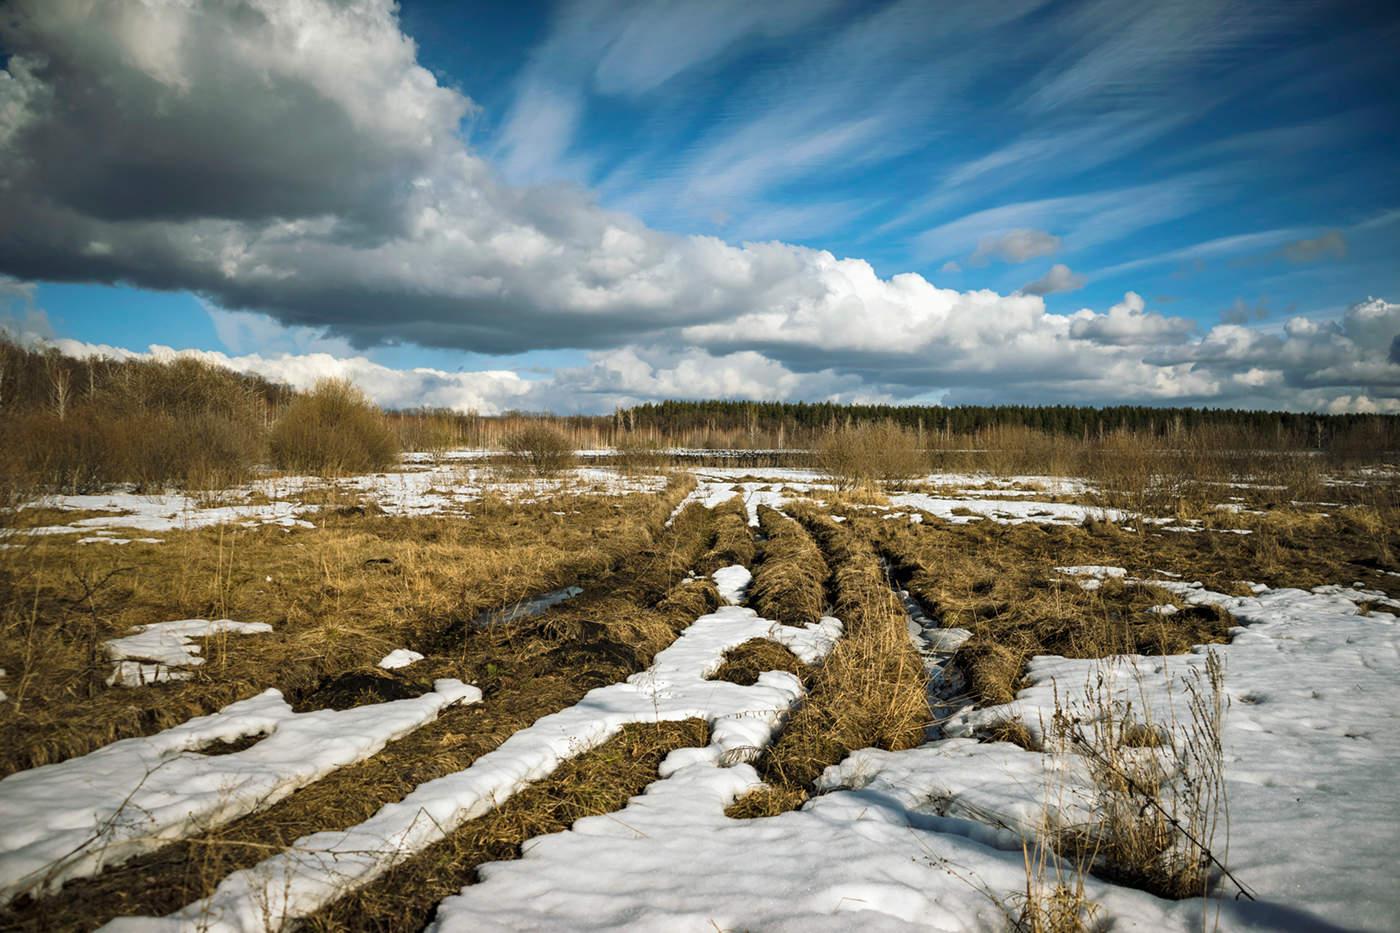 Фото весенних полей со снегом